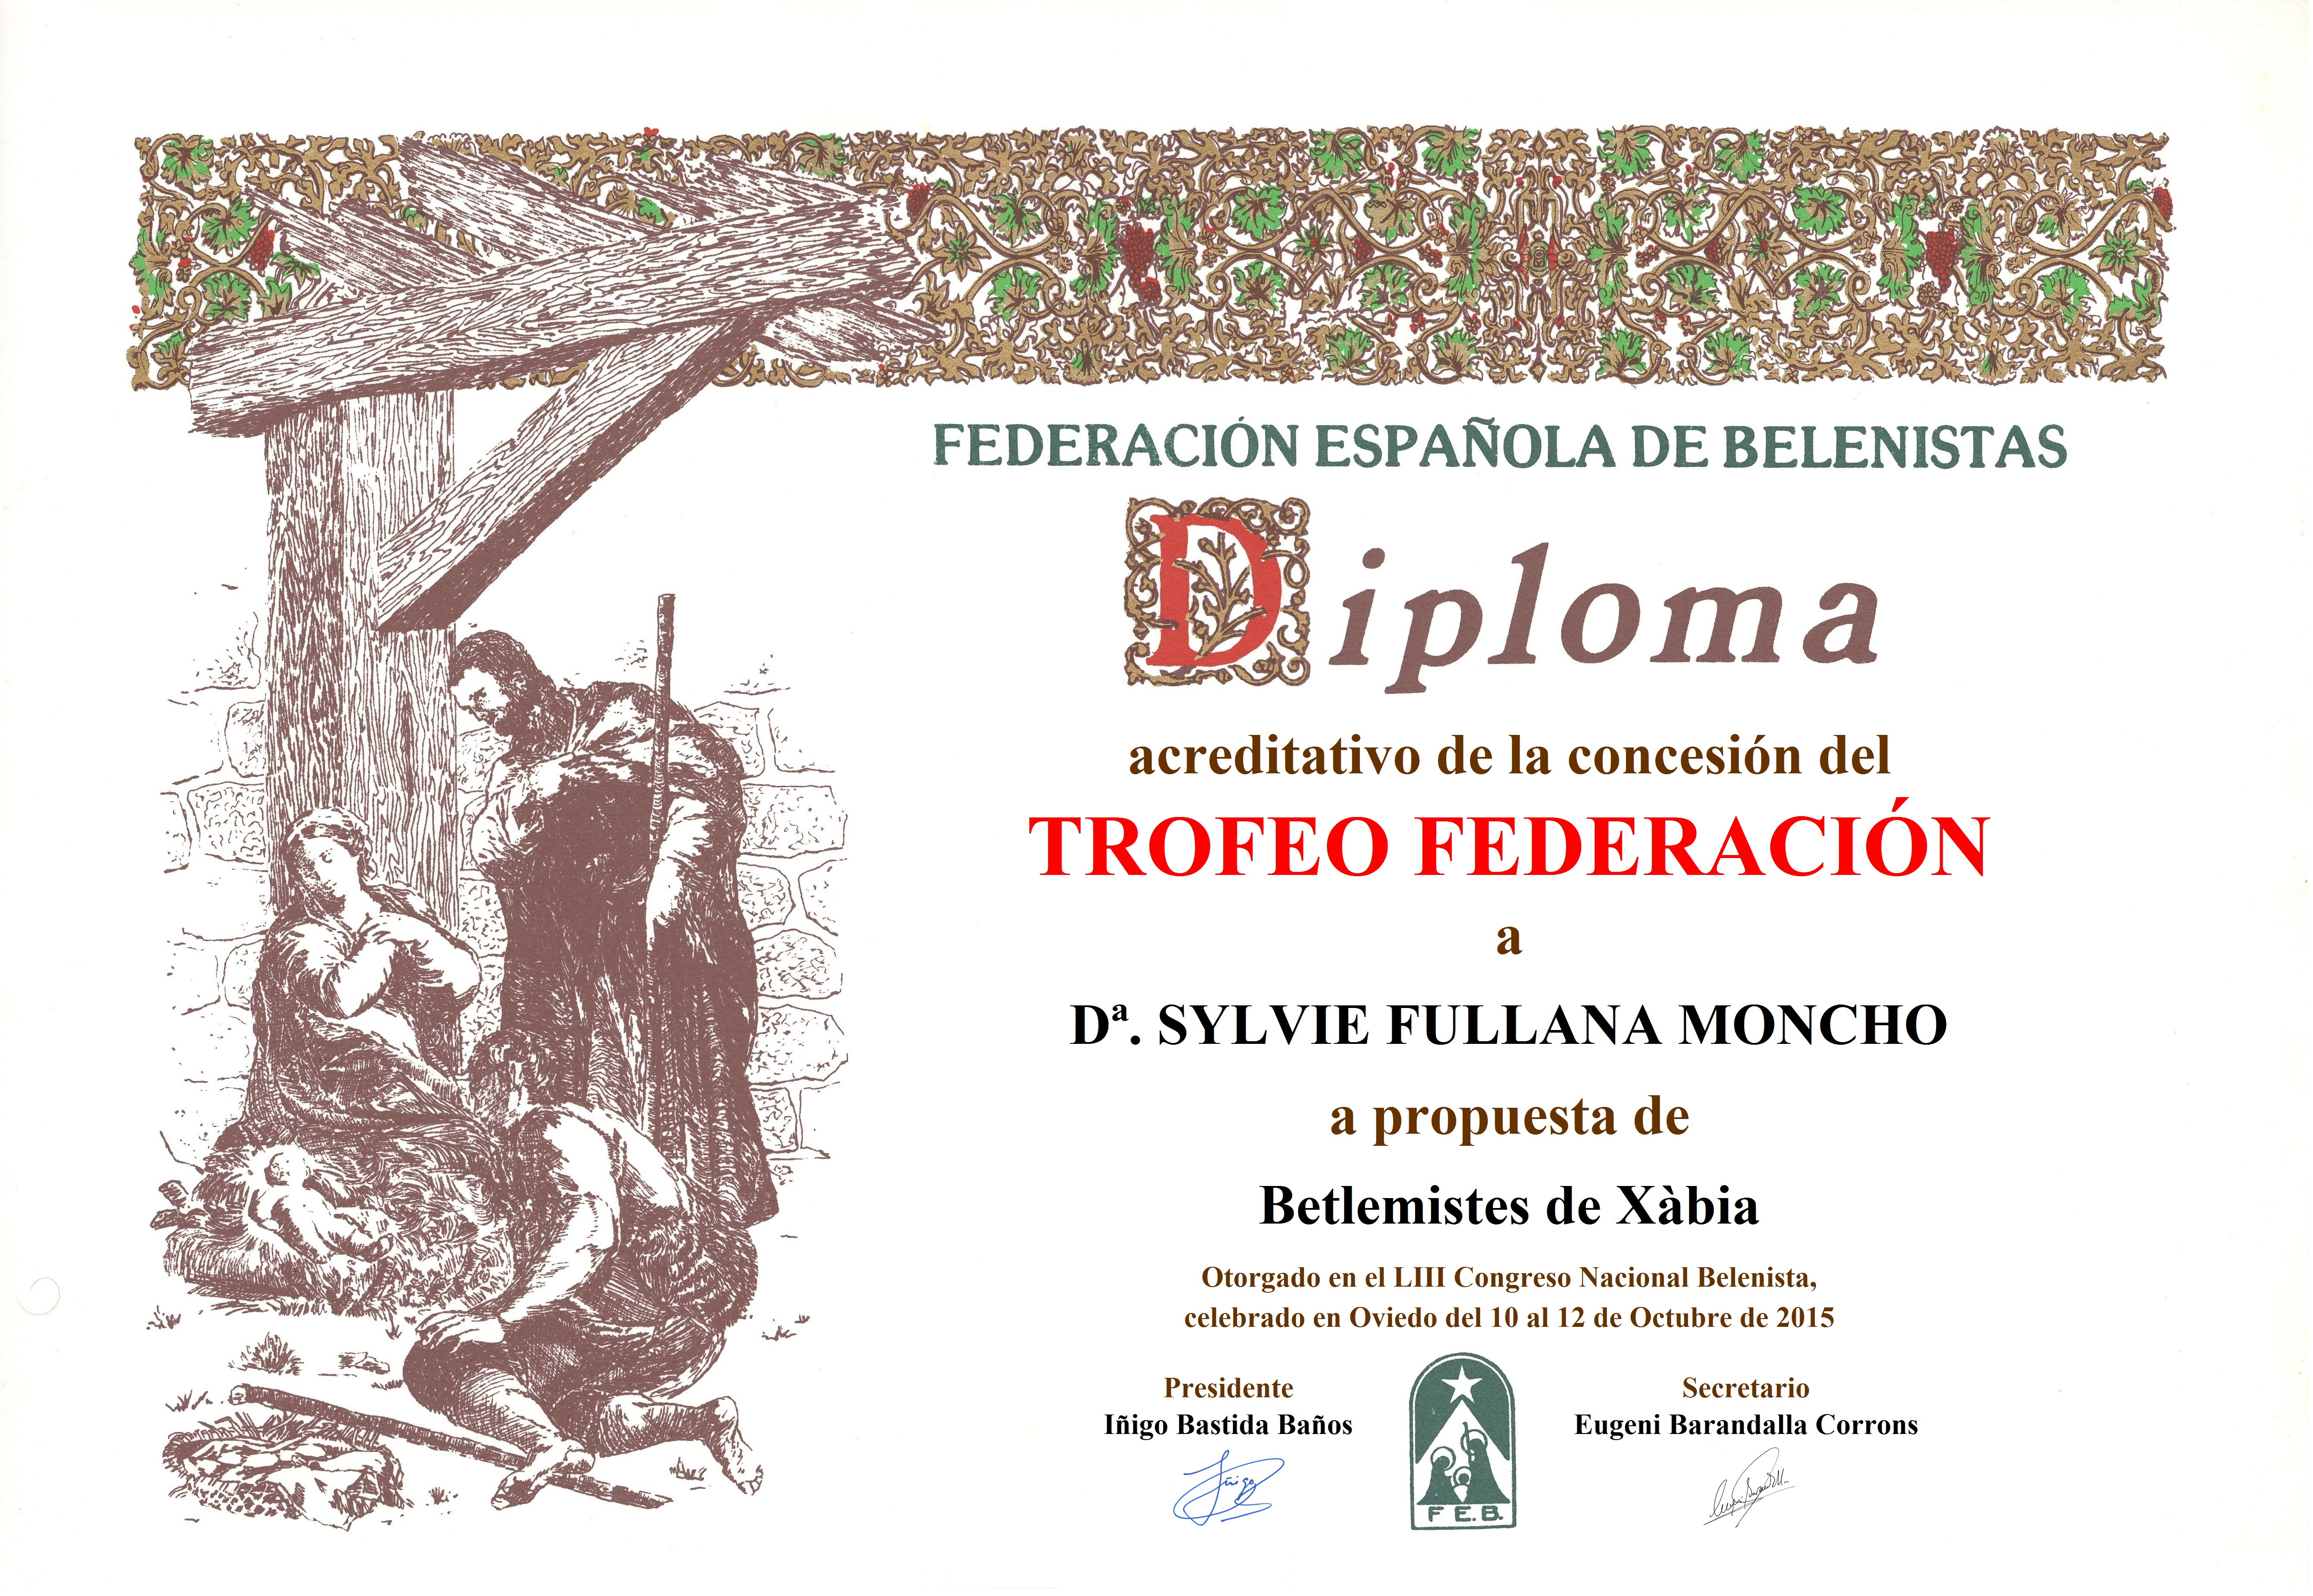 Diploma Trofeo FEB 2015 Sylvie Fullana Moncho